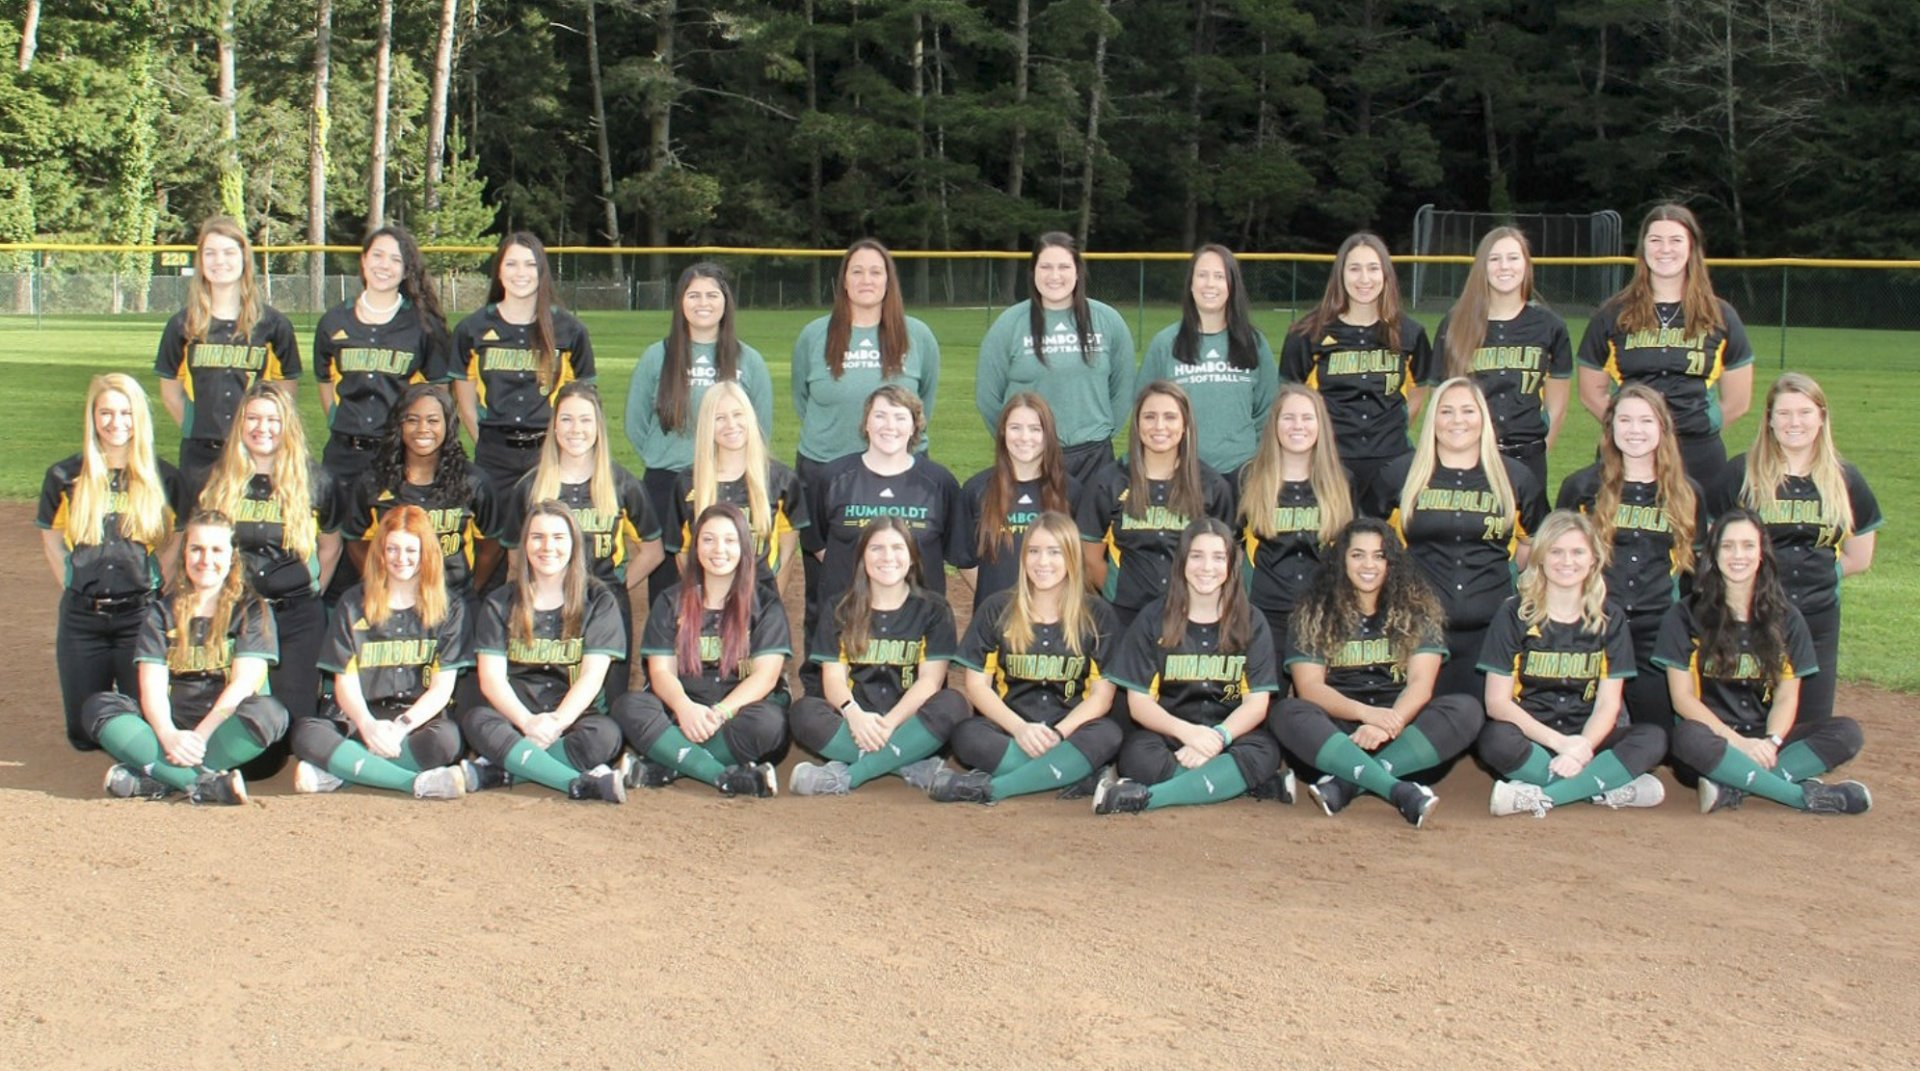 2019 Humboldt State softball team  Photo courtesy by Humboldt State Athletics.